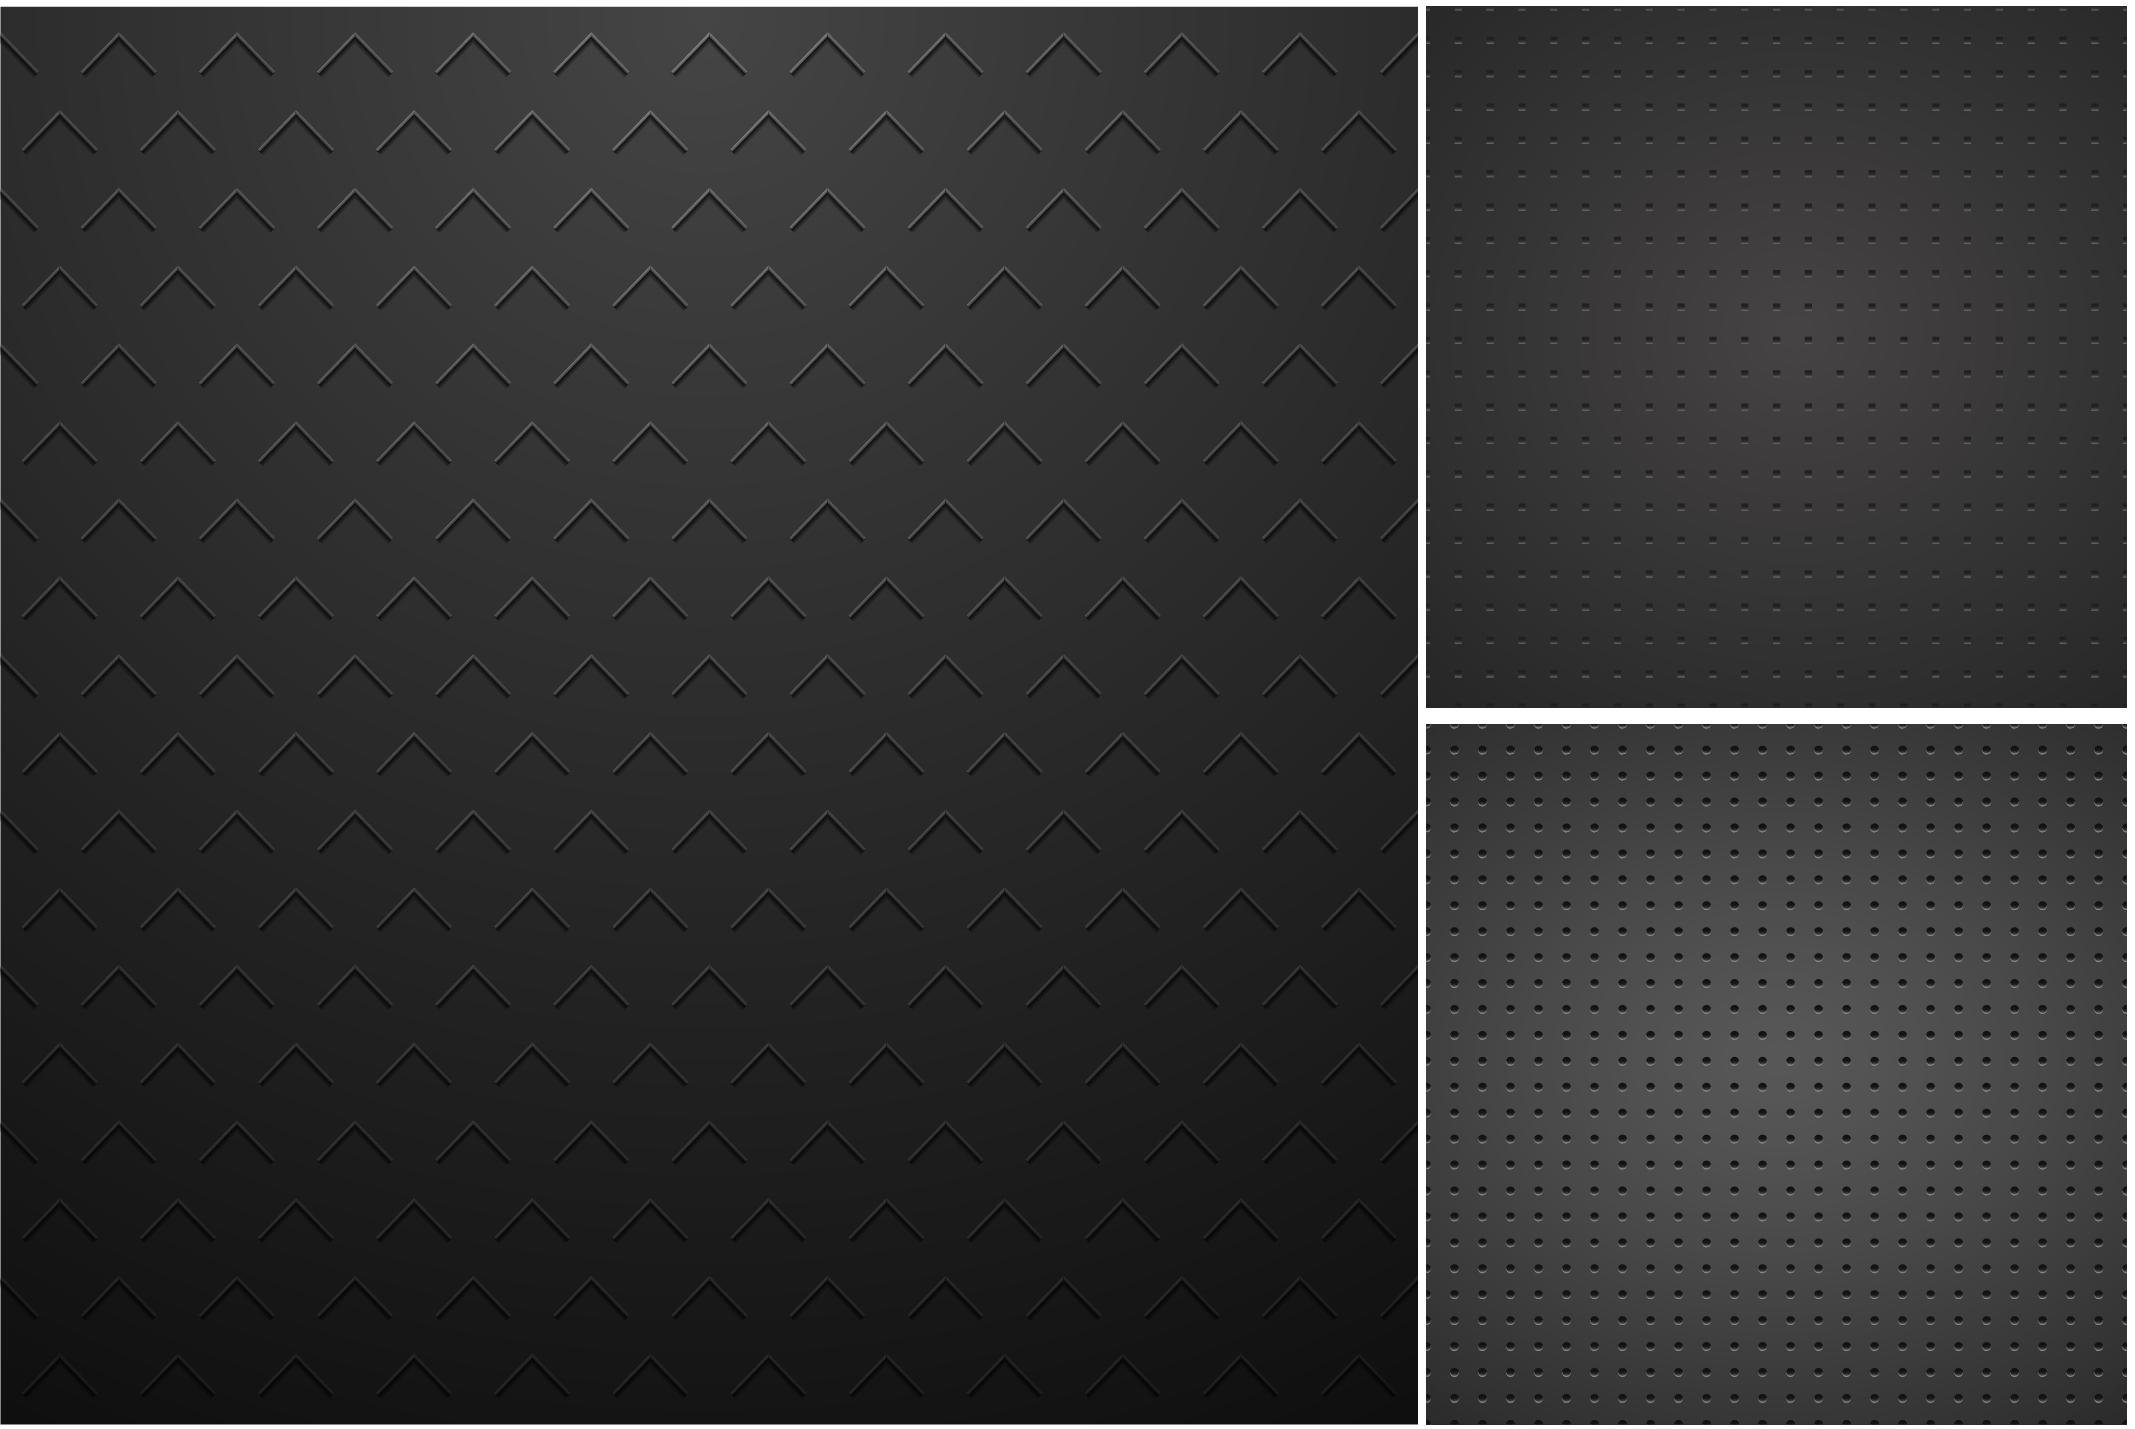 Metallic dark textures with holes. example image 5